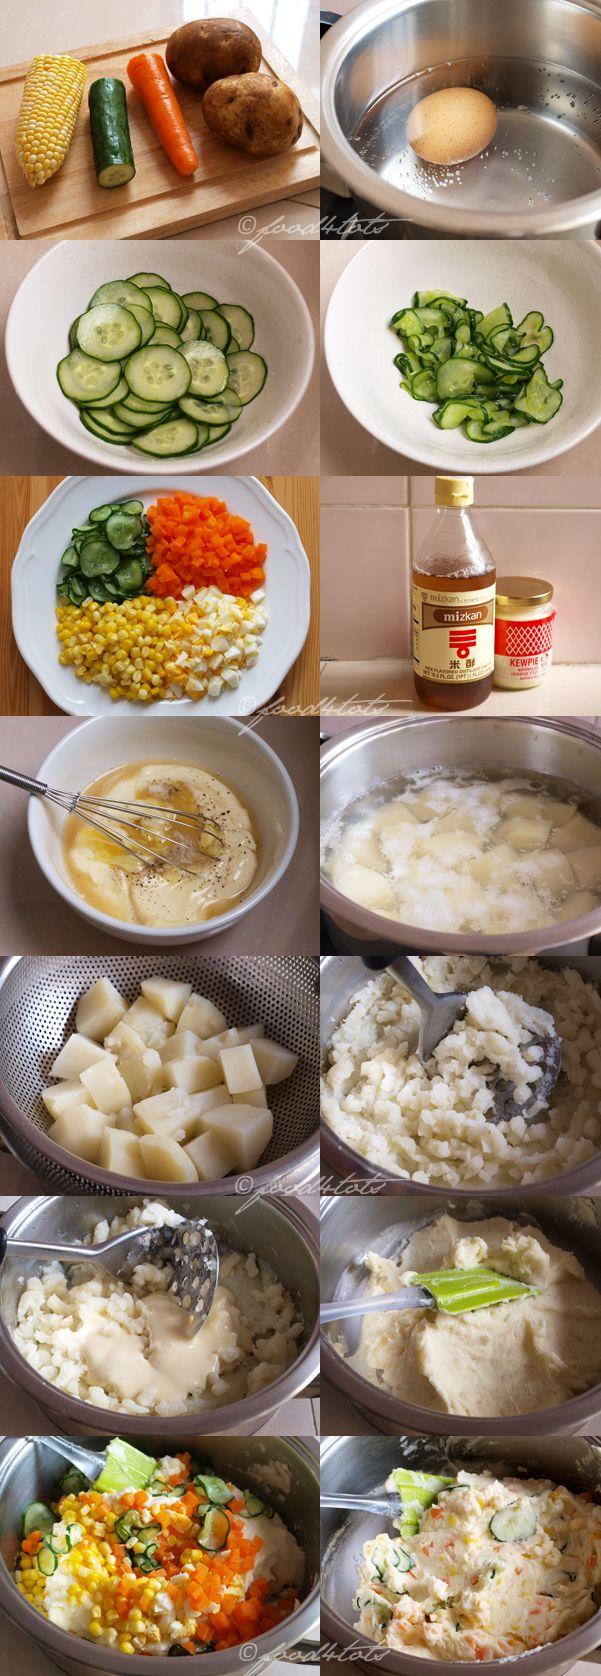 step by step, Japanese salad, potato salad, kid, toddler, vegetarian, food for tots